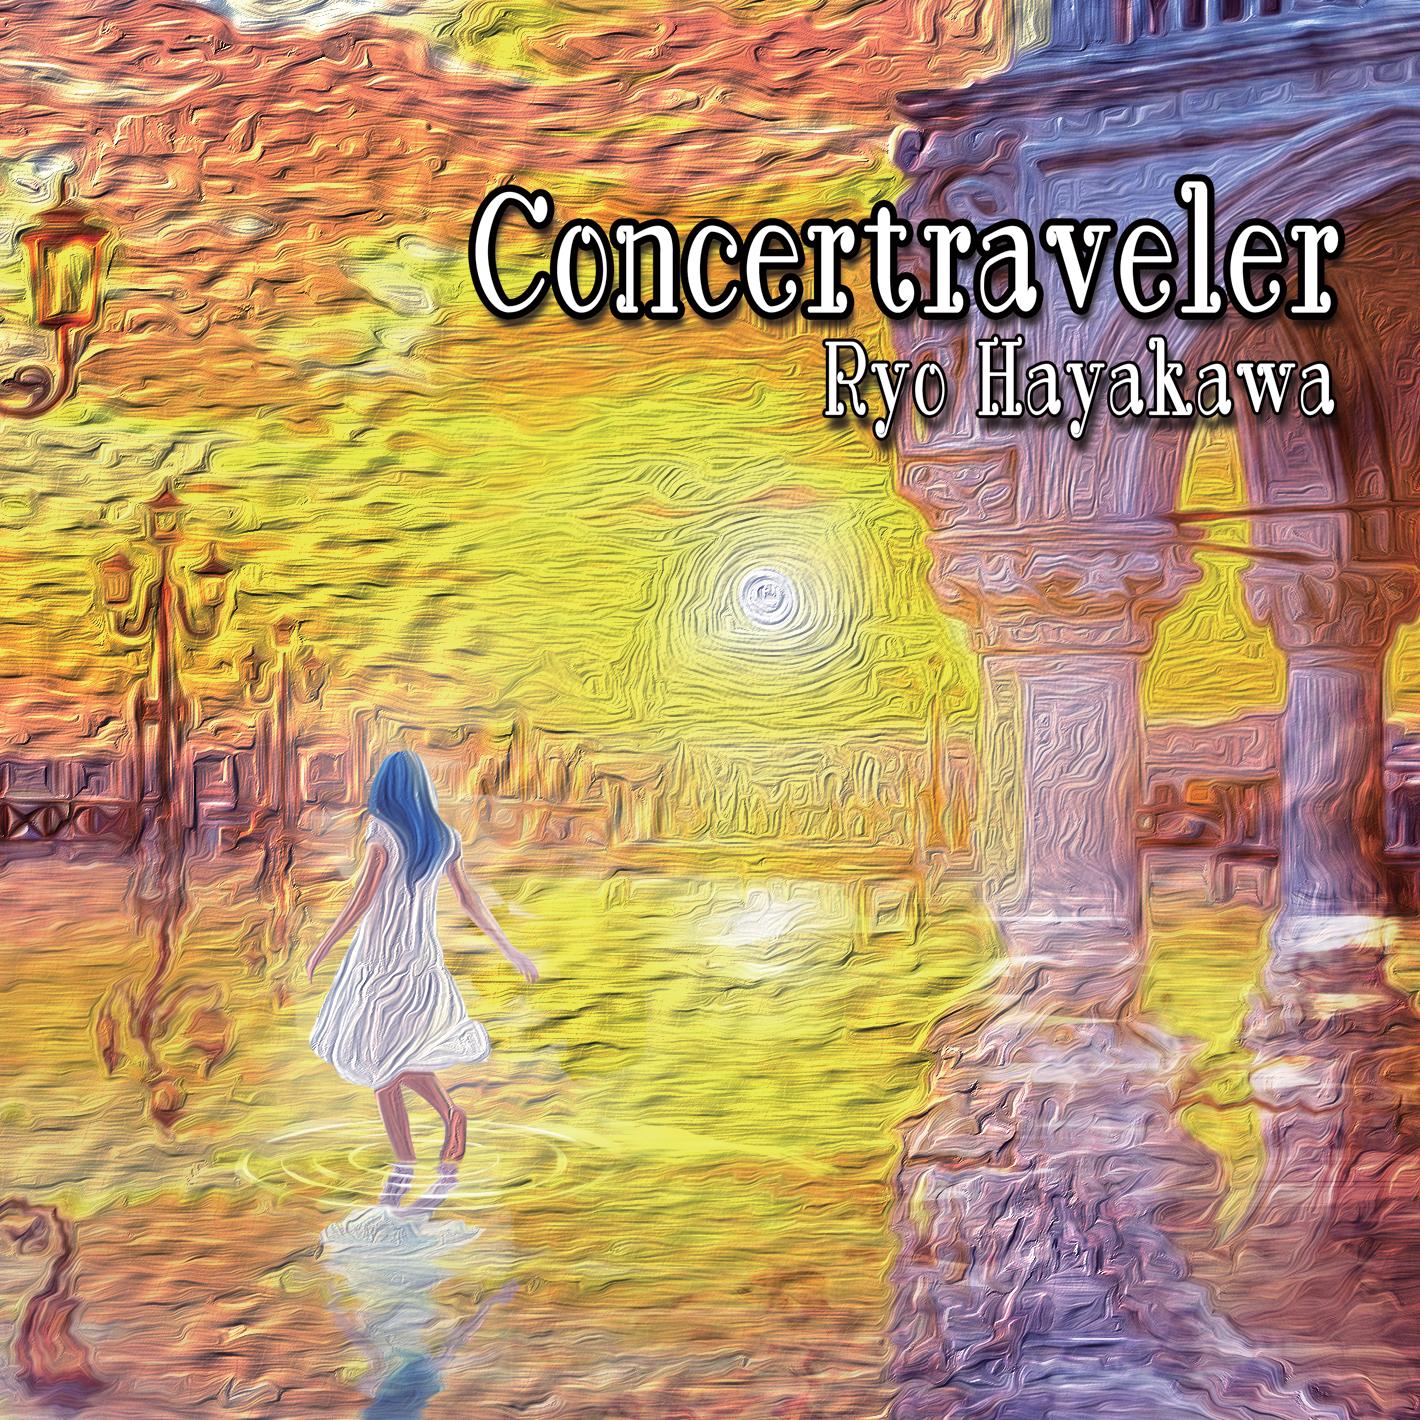 Concertraveler